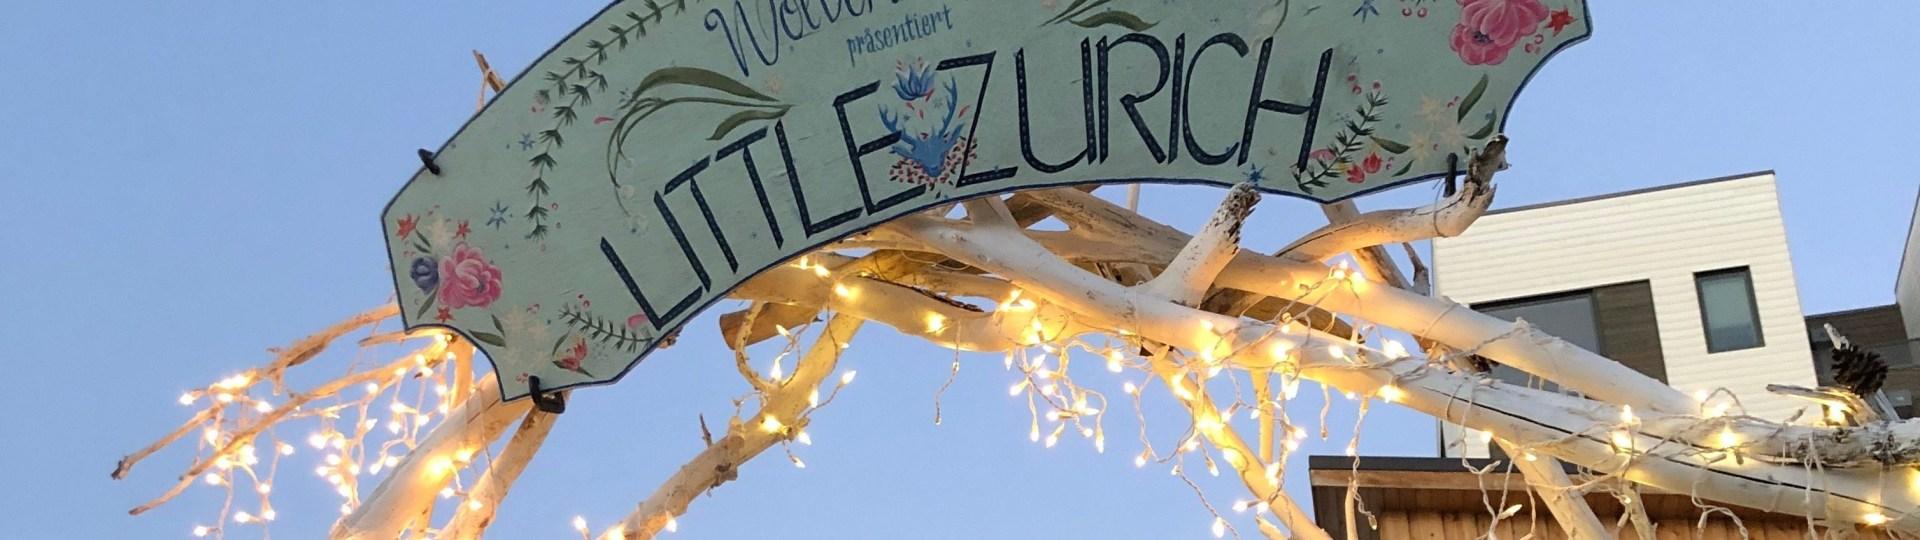 Little Zurich: An Open-Air Holiday Market in Fort Collins